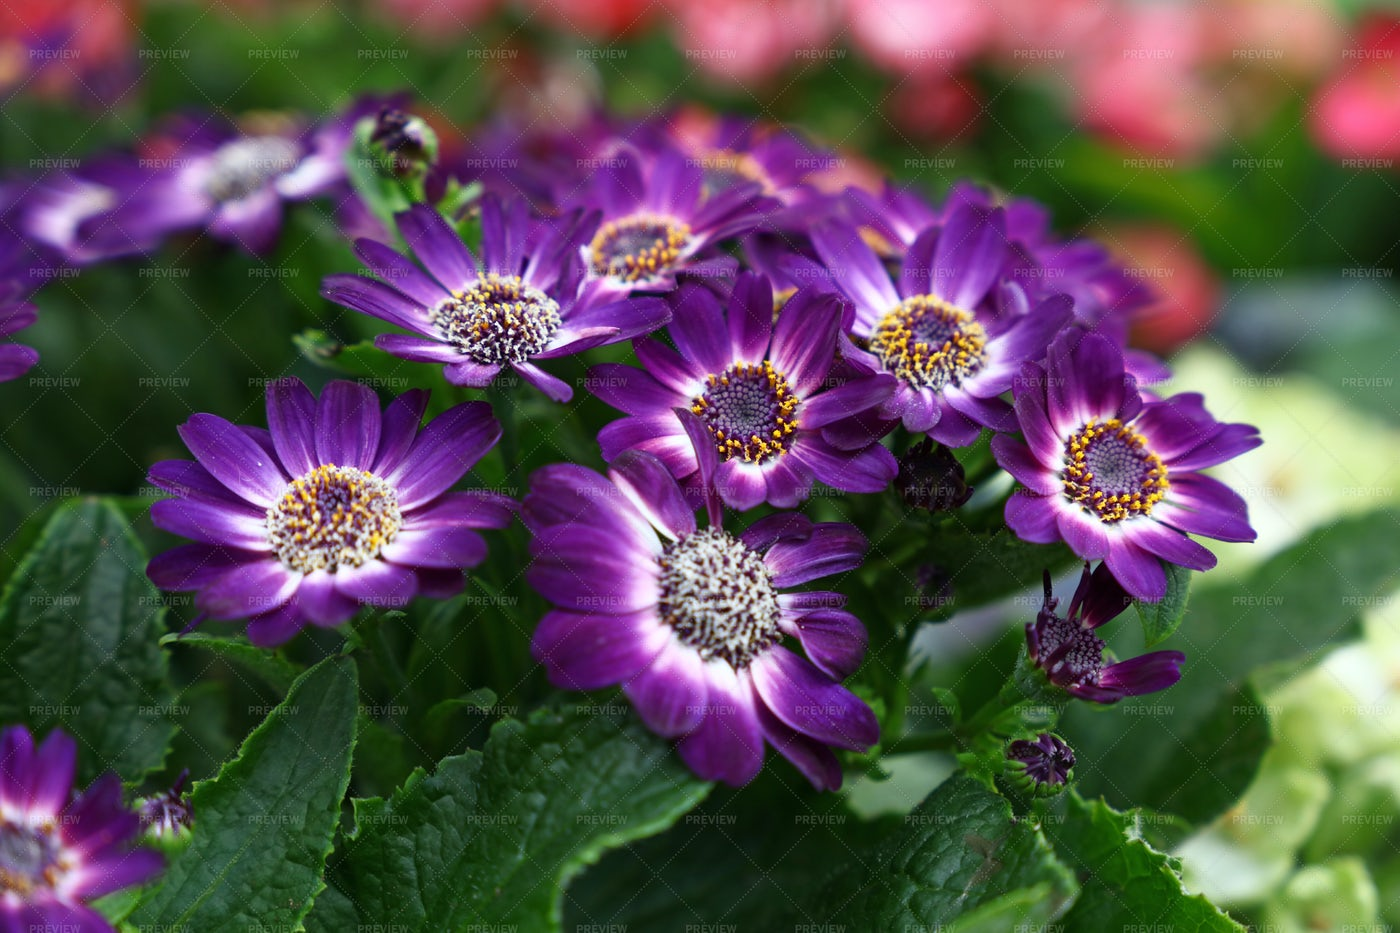 Purple Cineraria Flowers: Stock Photos